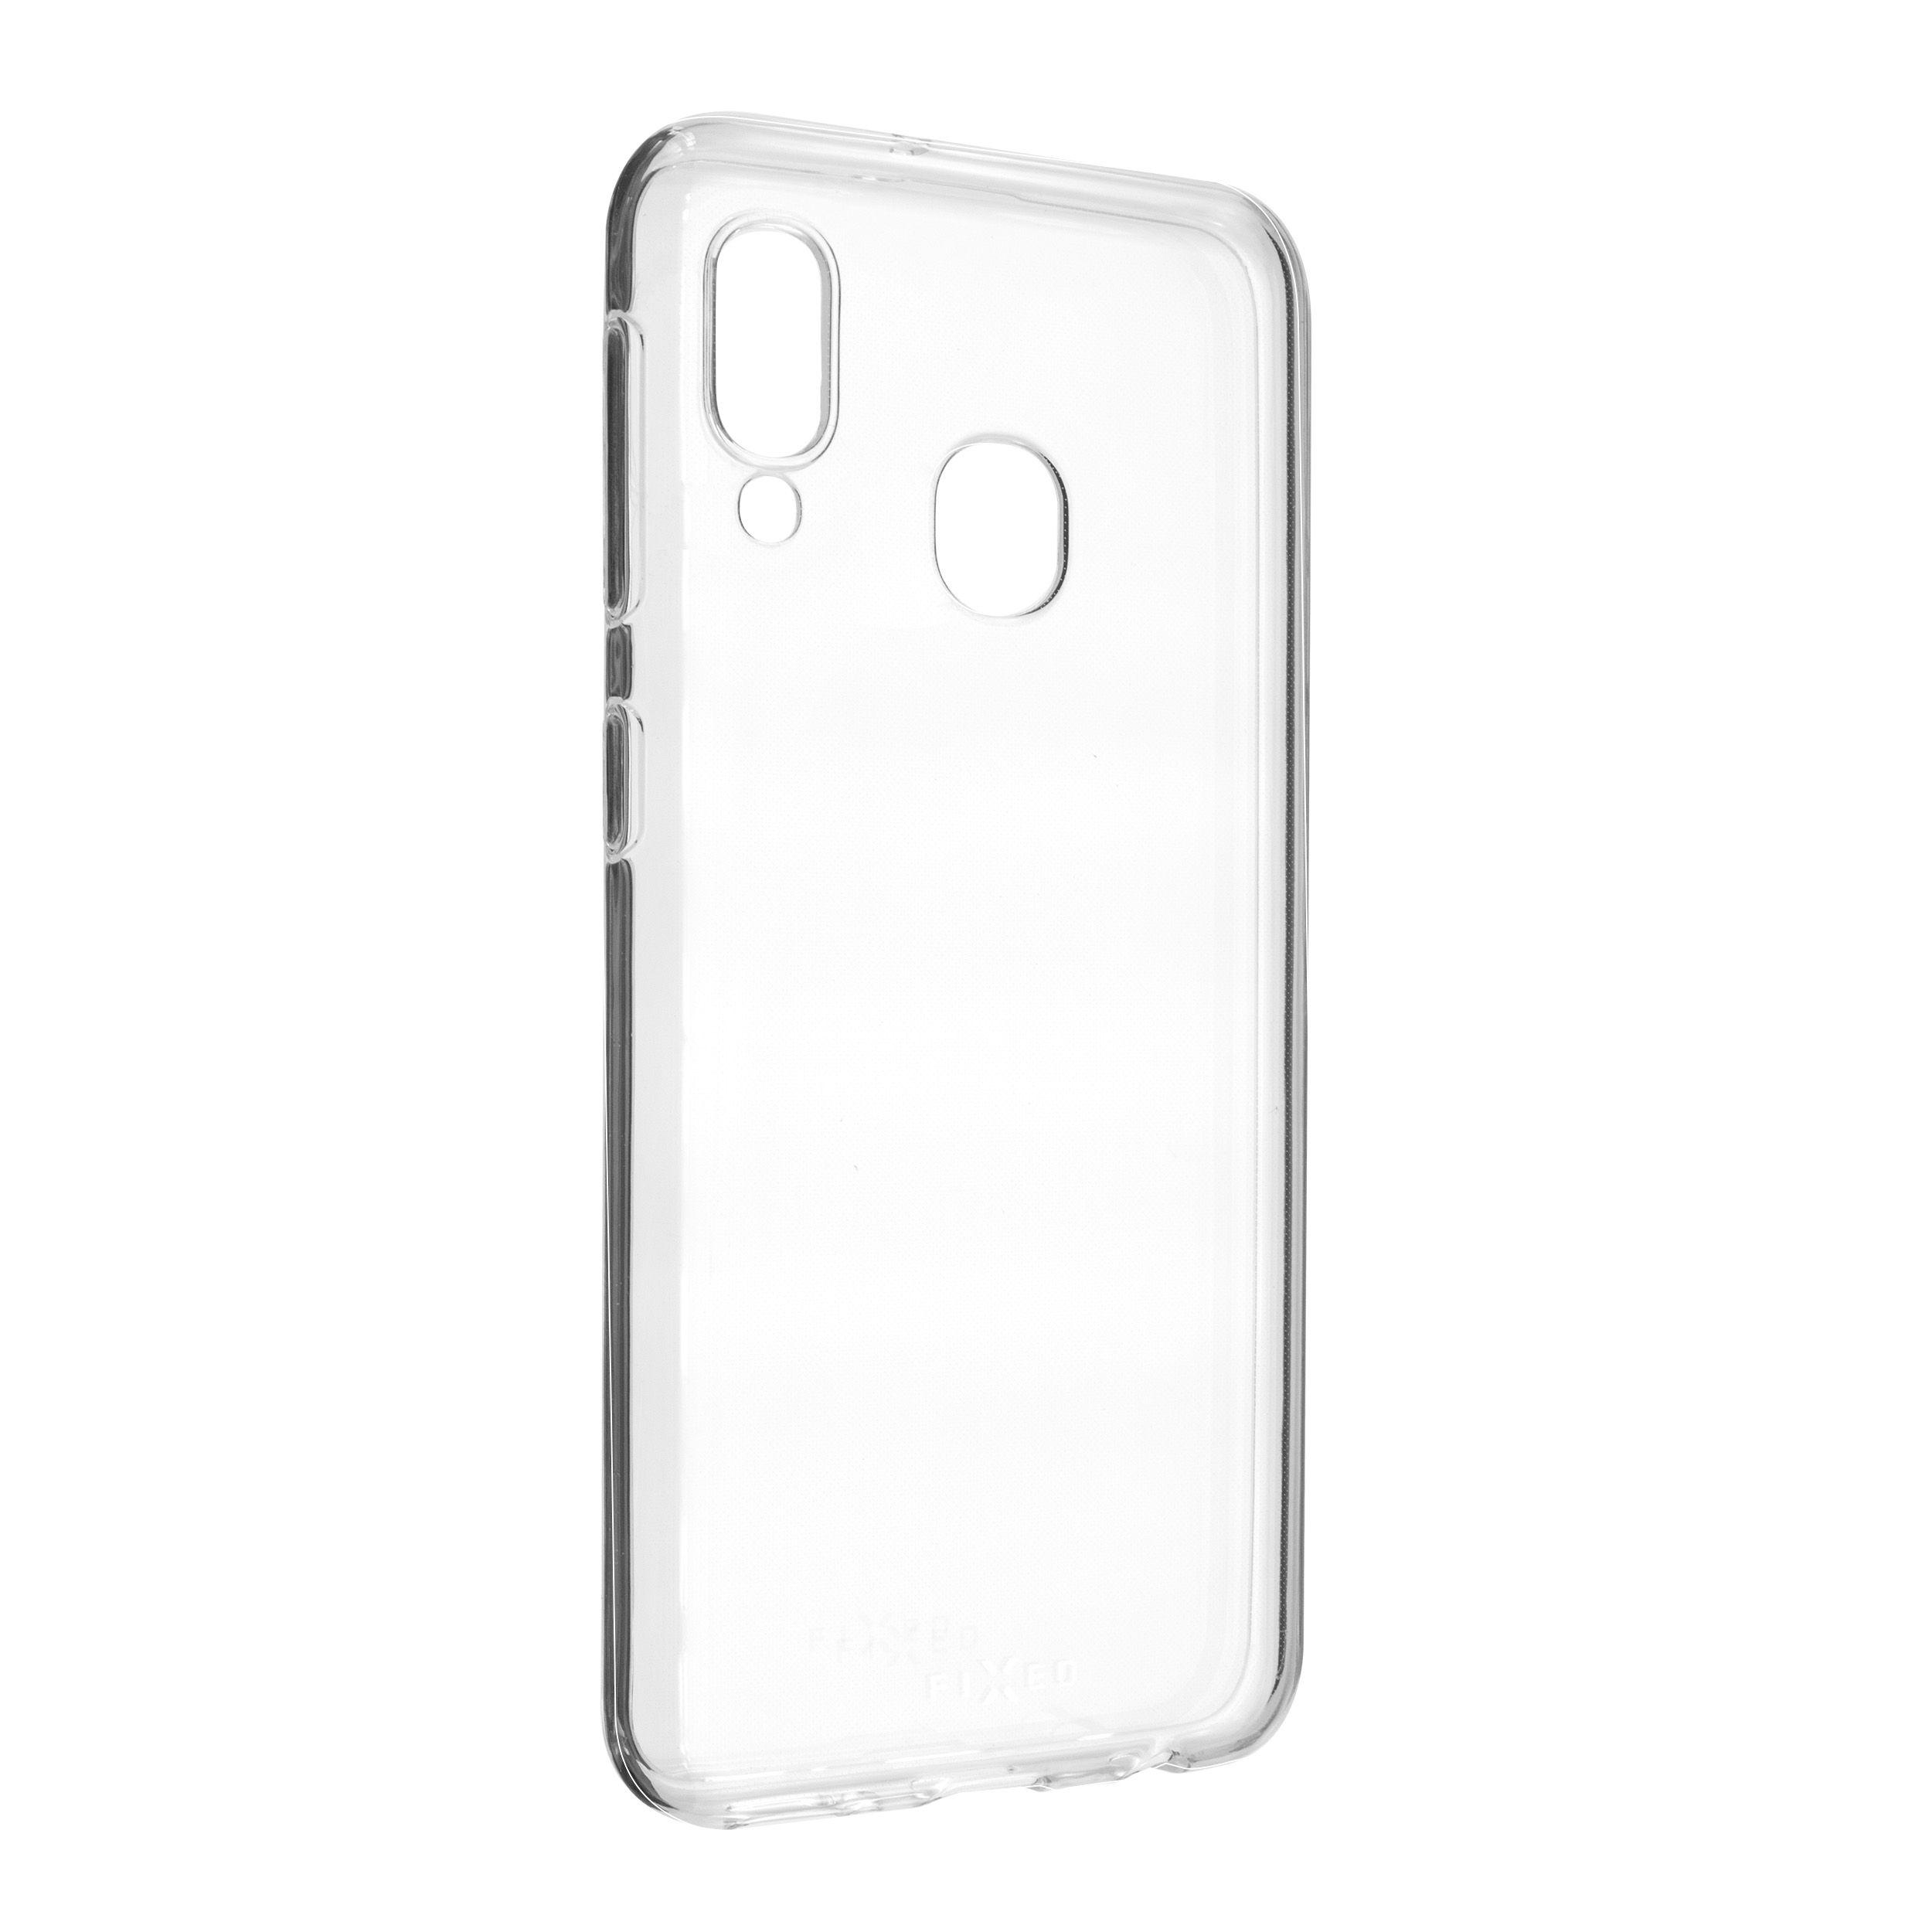 TPU gelové pouzdro FIXED pro Samsung Galaxy A20e, čiré